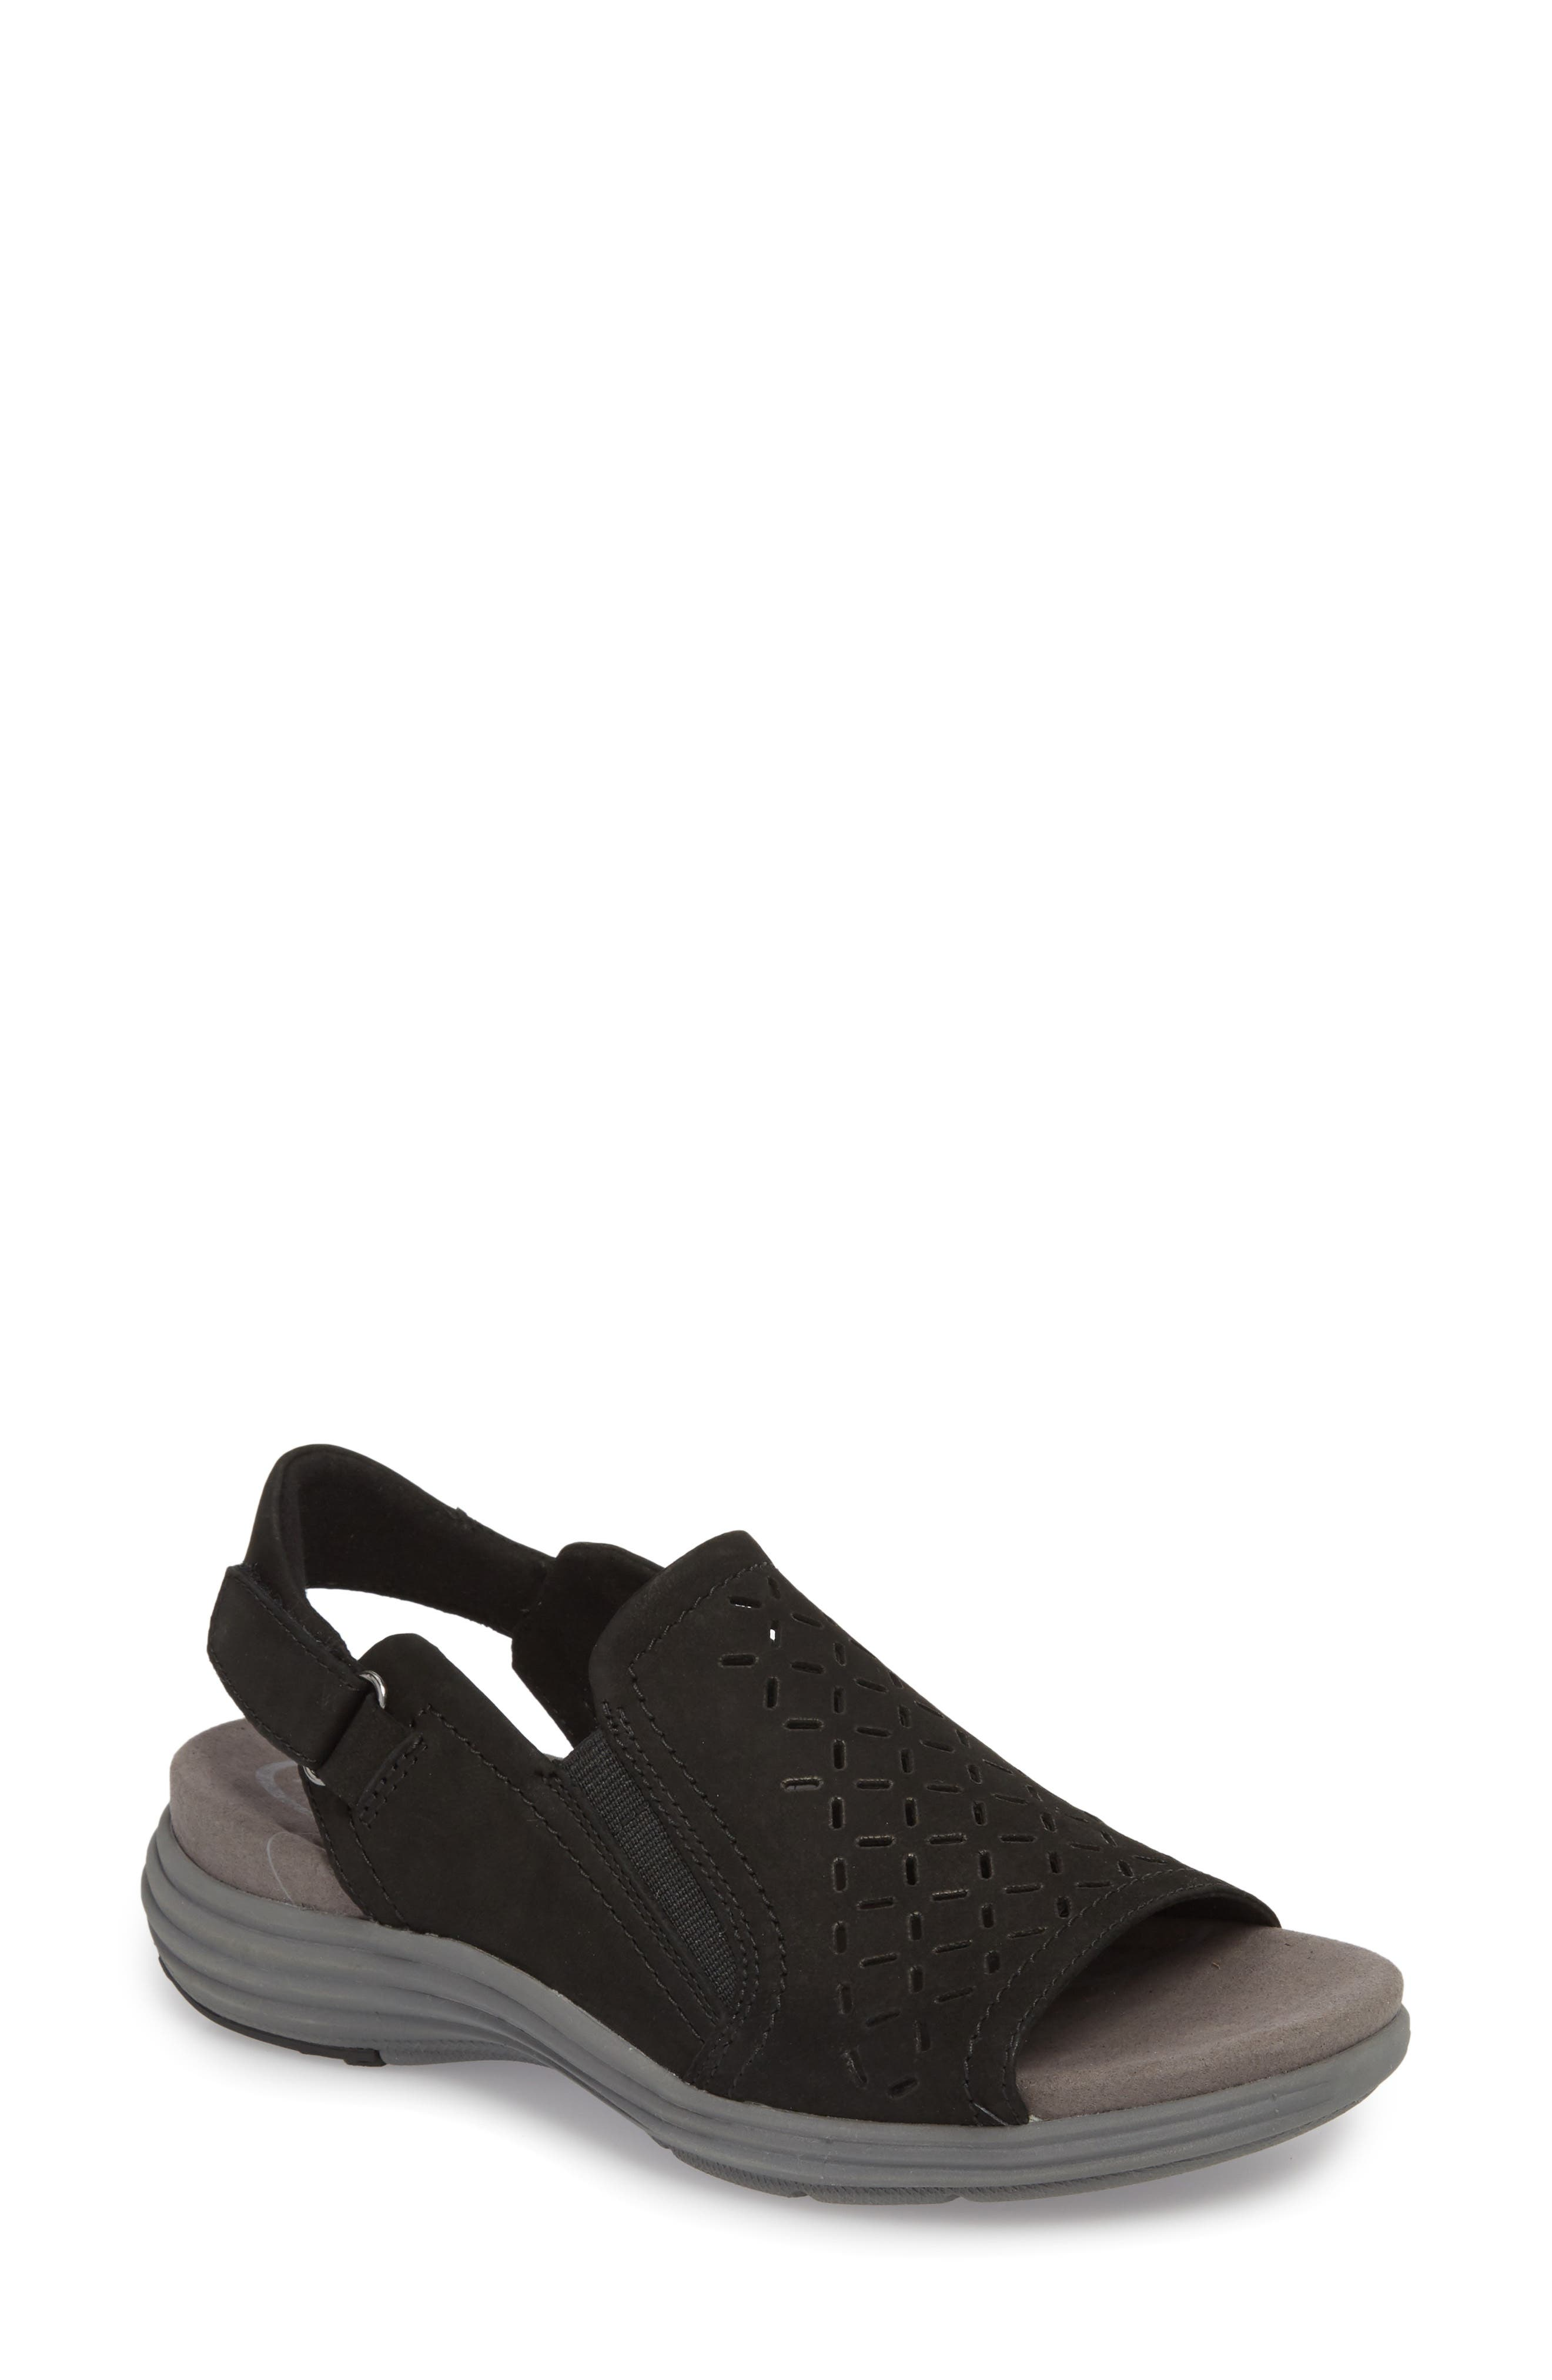 Beaumont Slingback Sandal,                         Main,                         color, Black Nubuck Leather